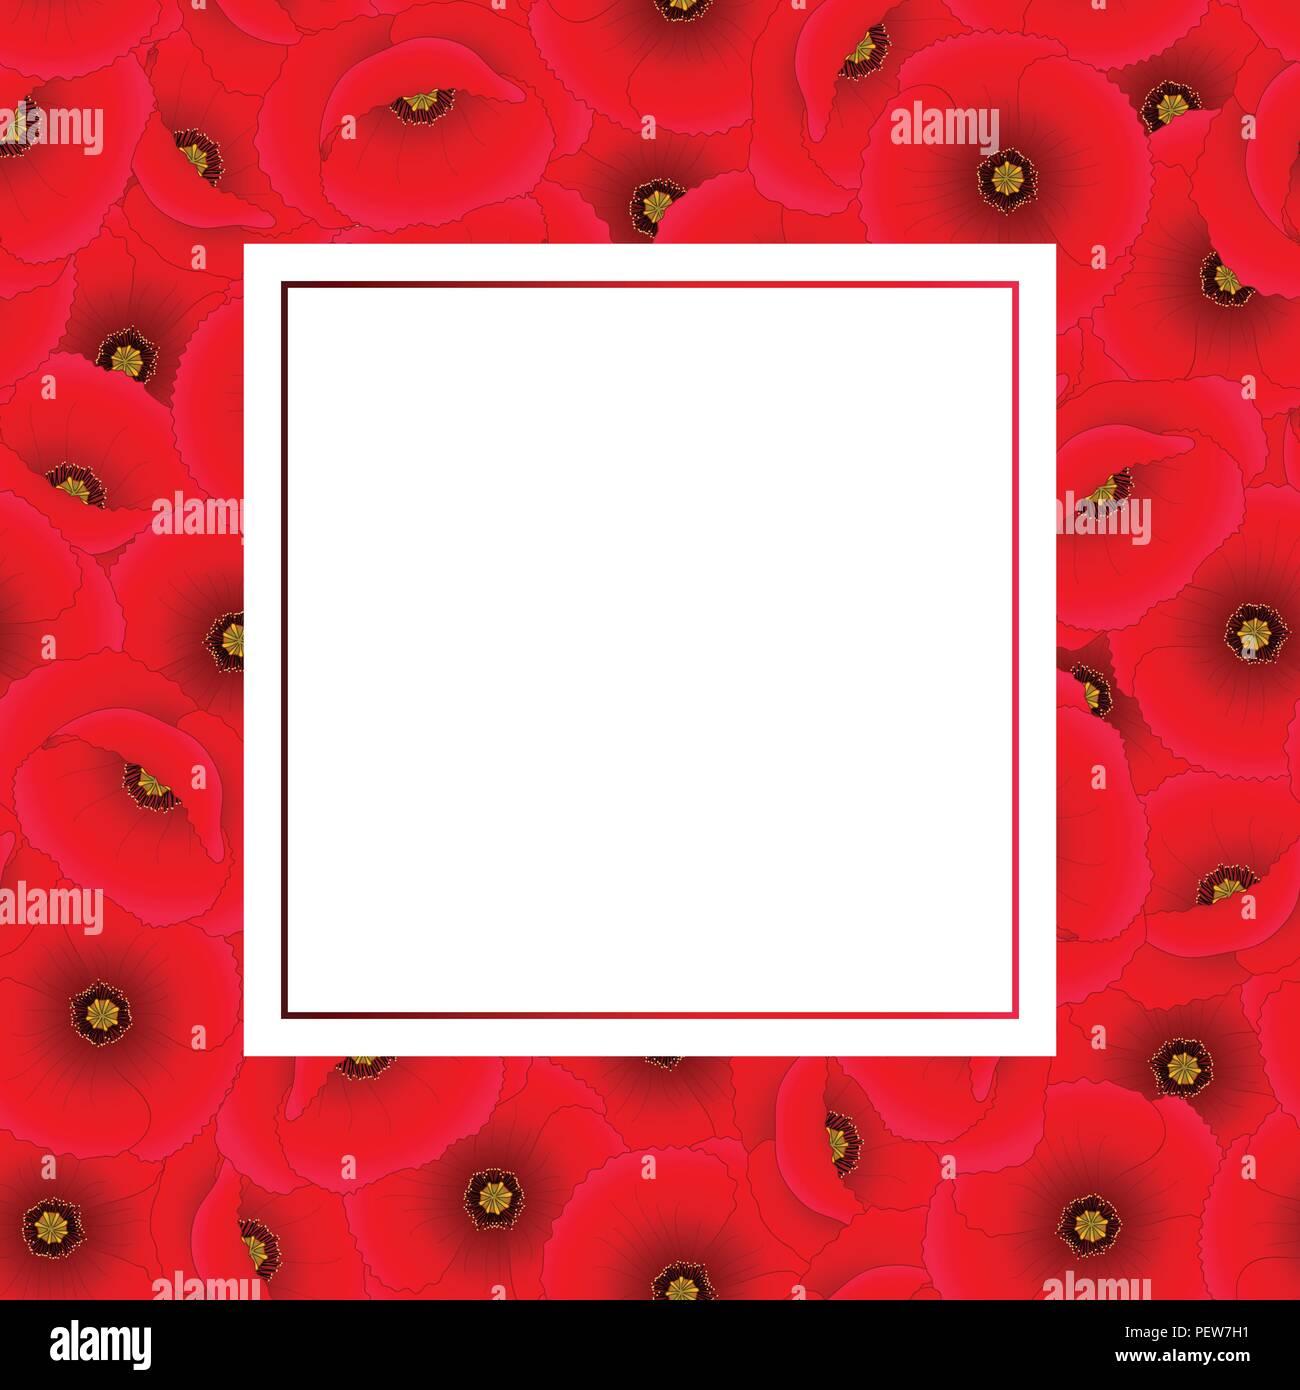 Papaver rhoeas Banner Card or common poppy,corn poppy,corn rose,field poppy,Flanders poppy or red poppy. Vector Illustration. - Stock Vector